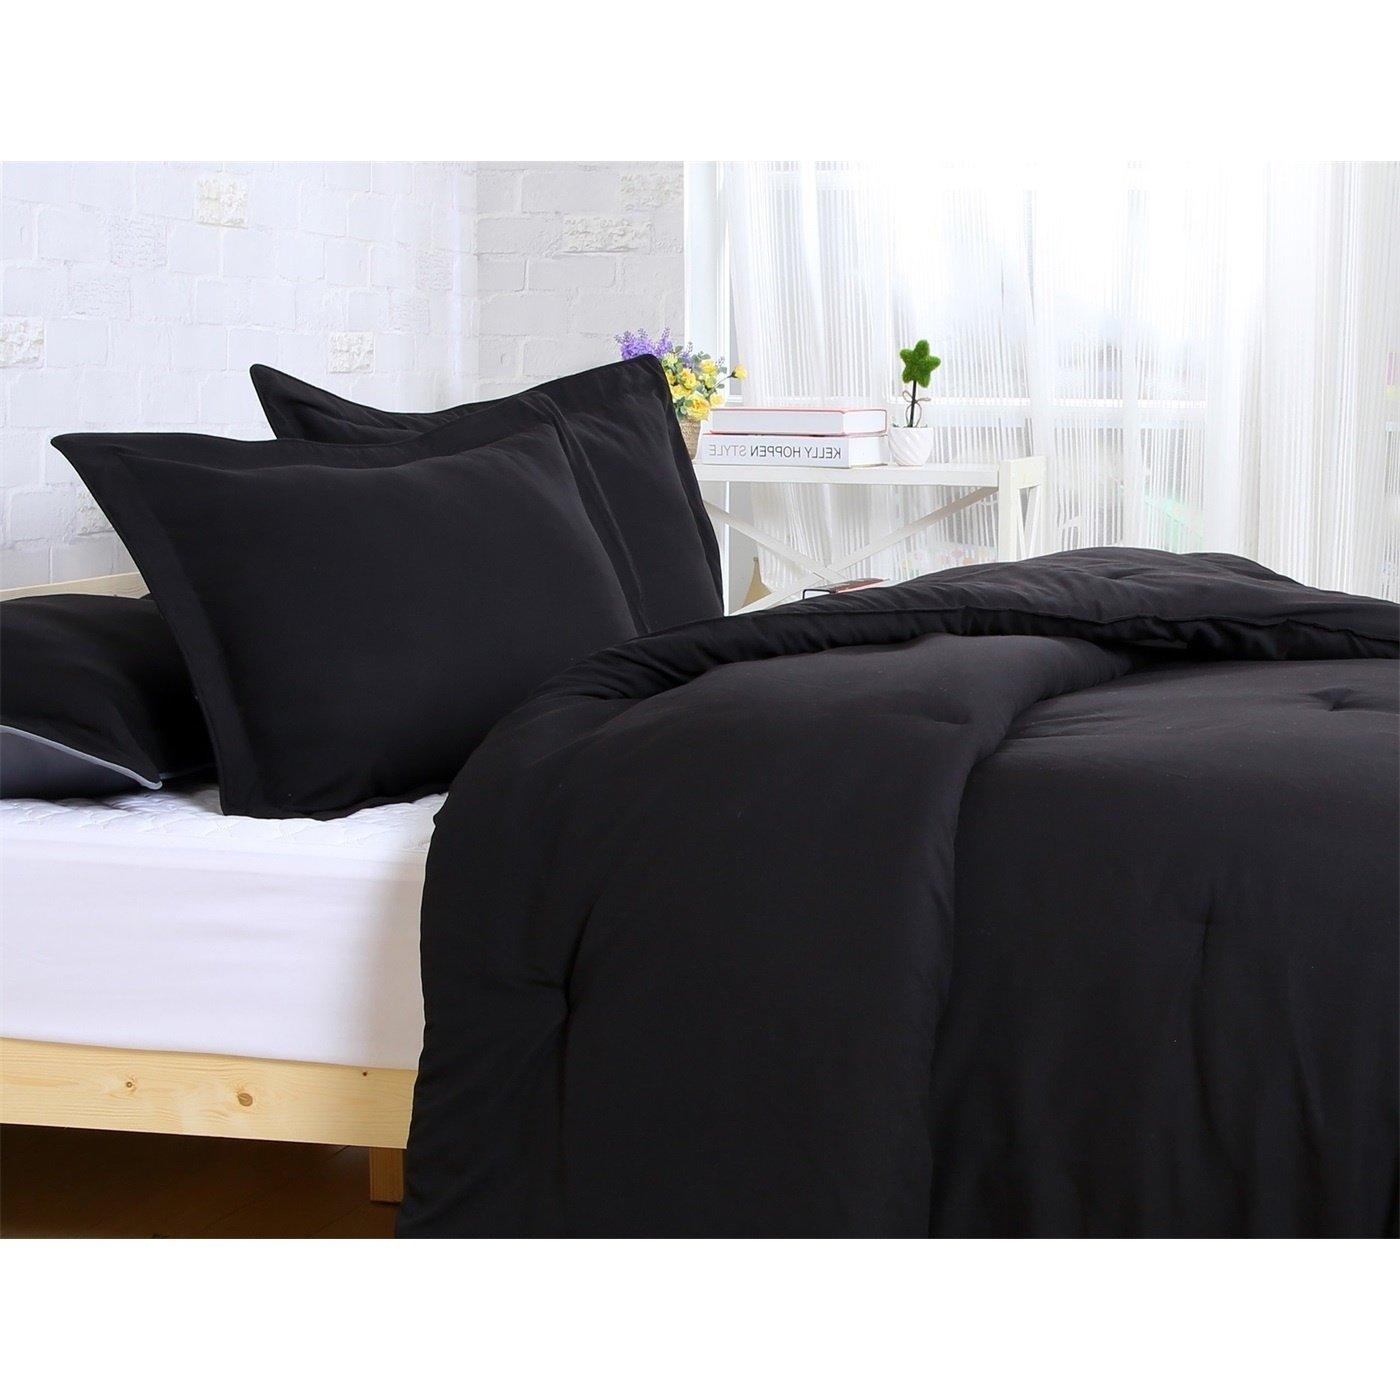 wayfair bed piece bath warm house stella reviews sets harbor comforter pdx set